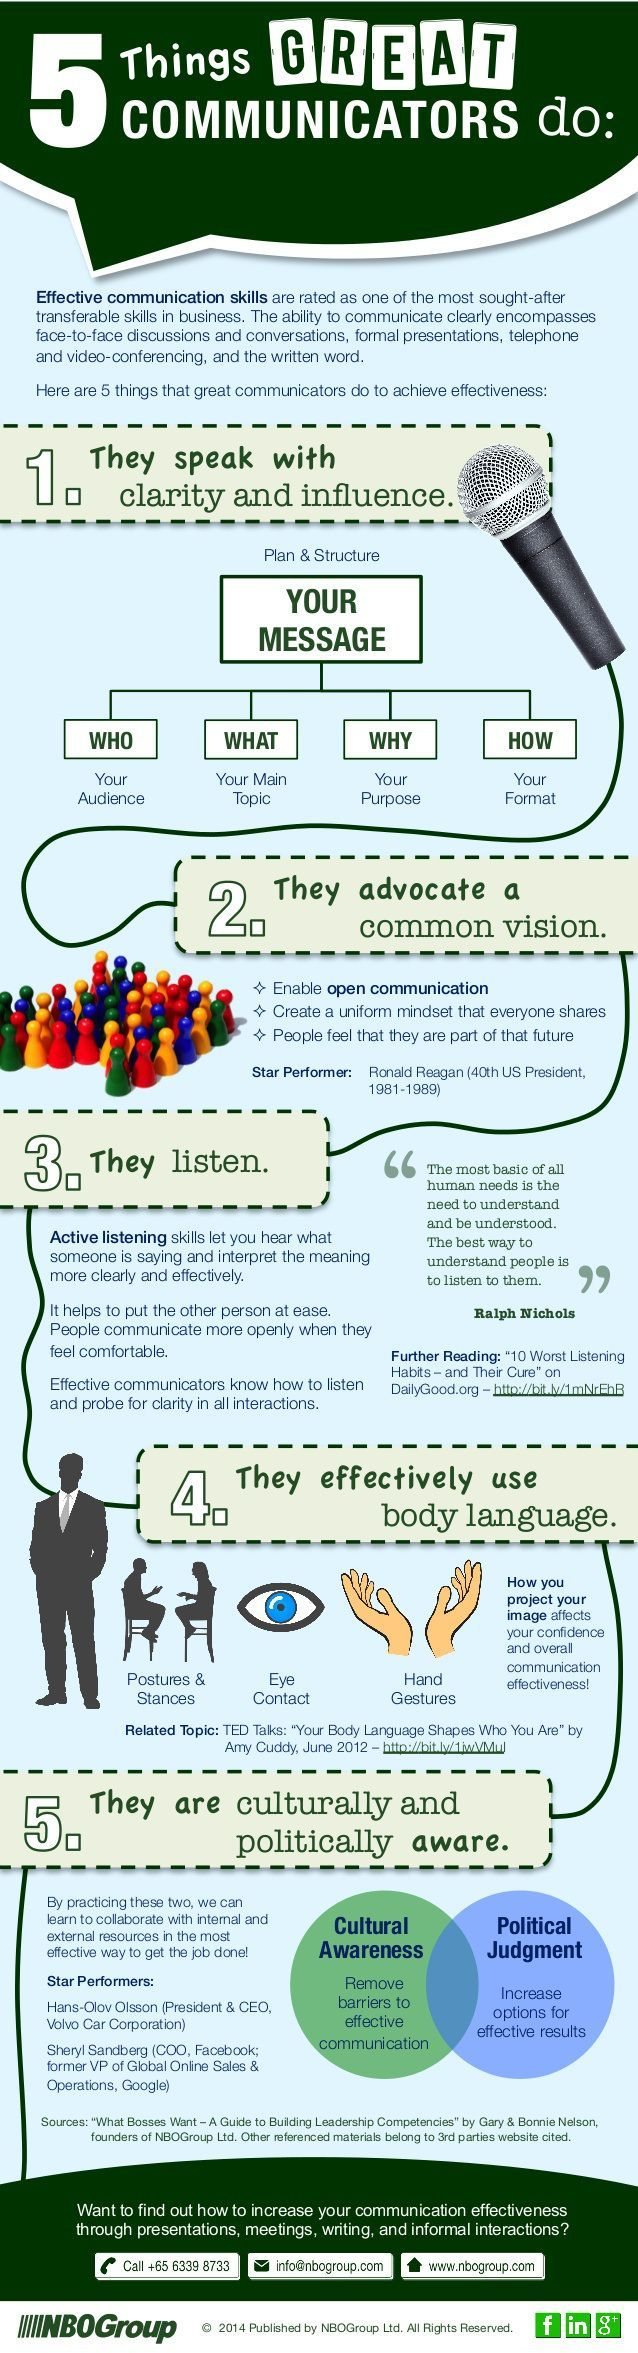 5 cosas que un gran comunicador hace #infografia #infographic#marketing